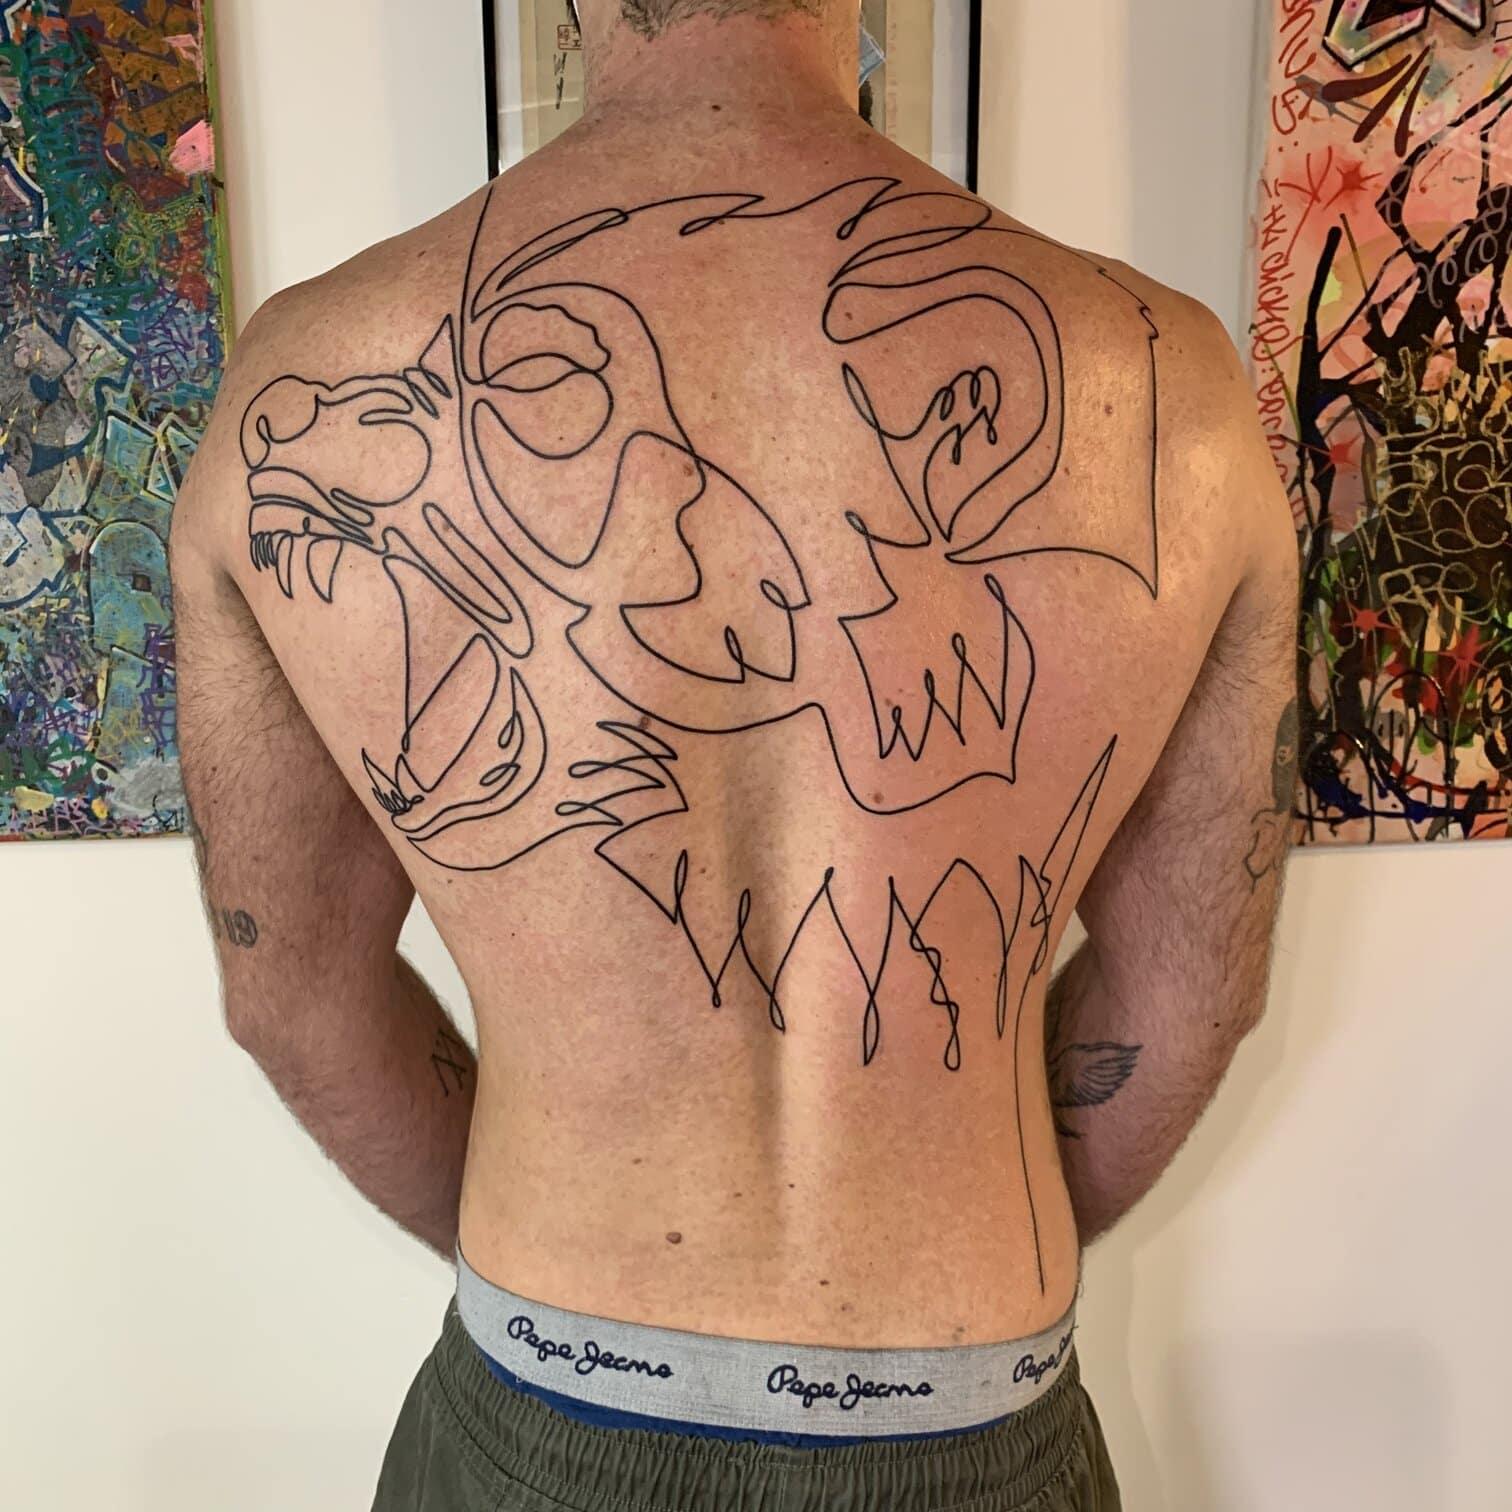 bims-kaizoku-tattoo-artist-oneline-monkey-back